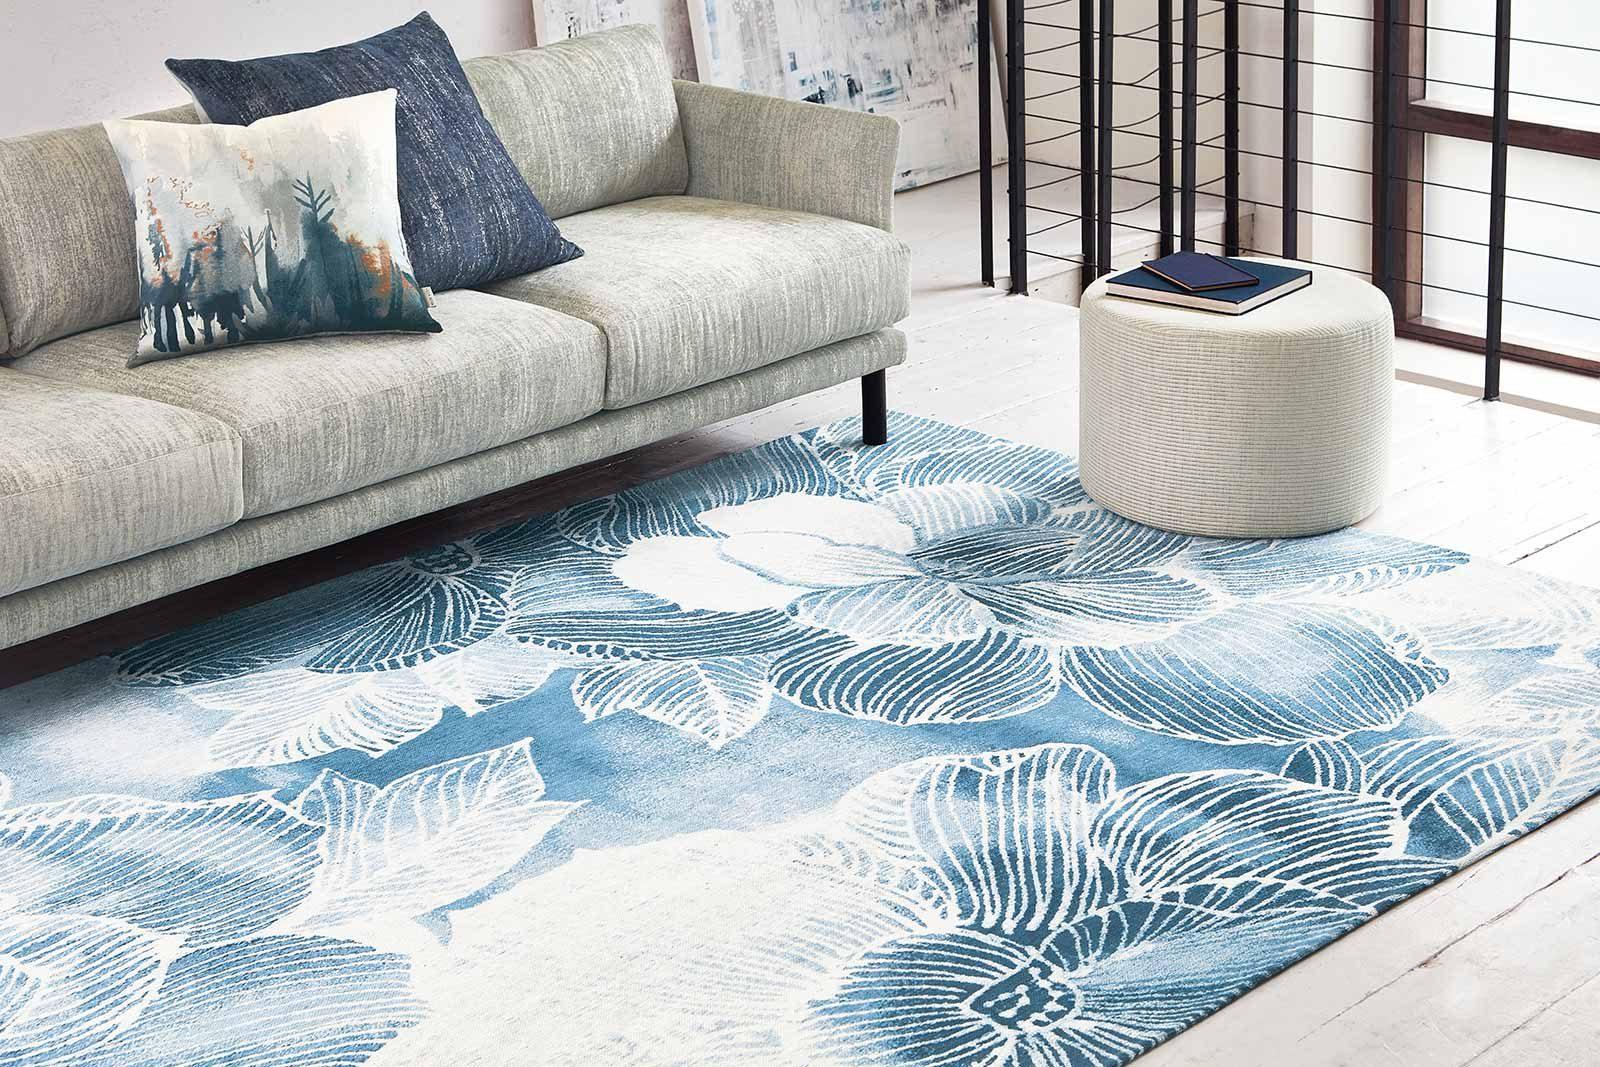 Louis De Poortere alfombras Villa Nova LX 8756 Akina Indigo interior